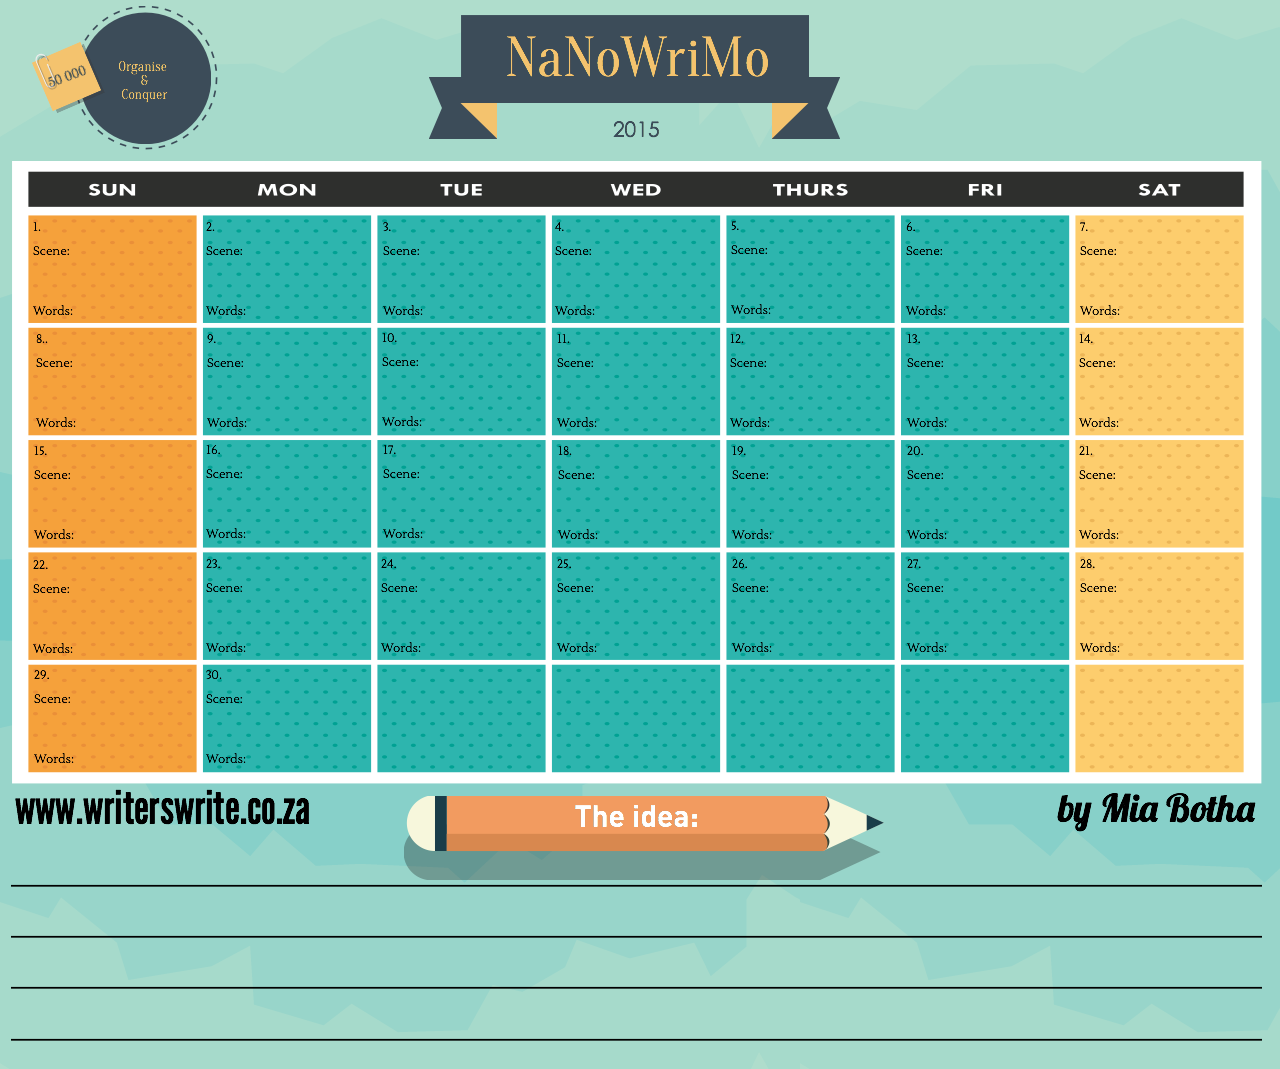 NaNoWriMo Calendar – Organise and Conquer!